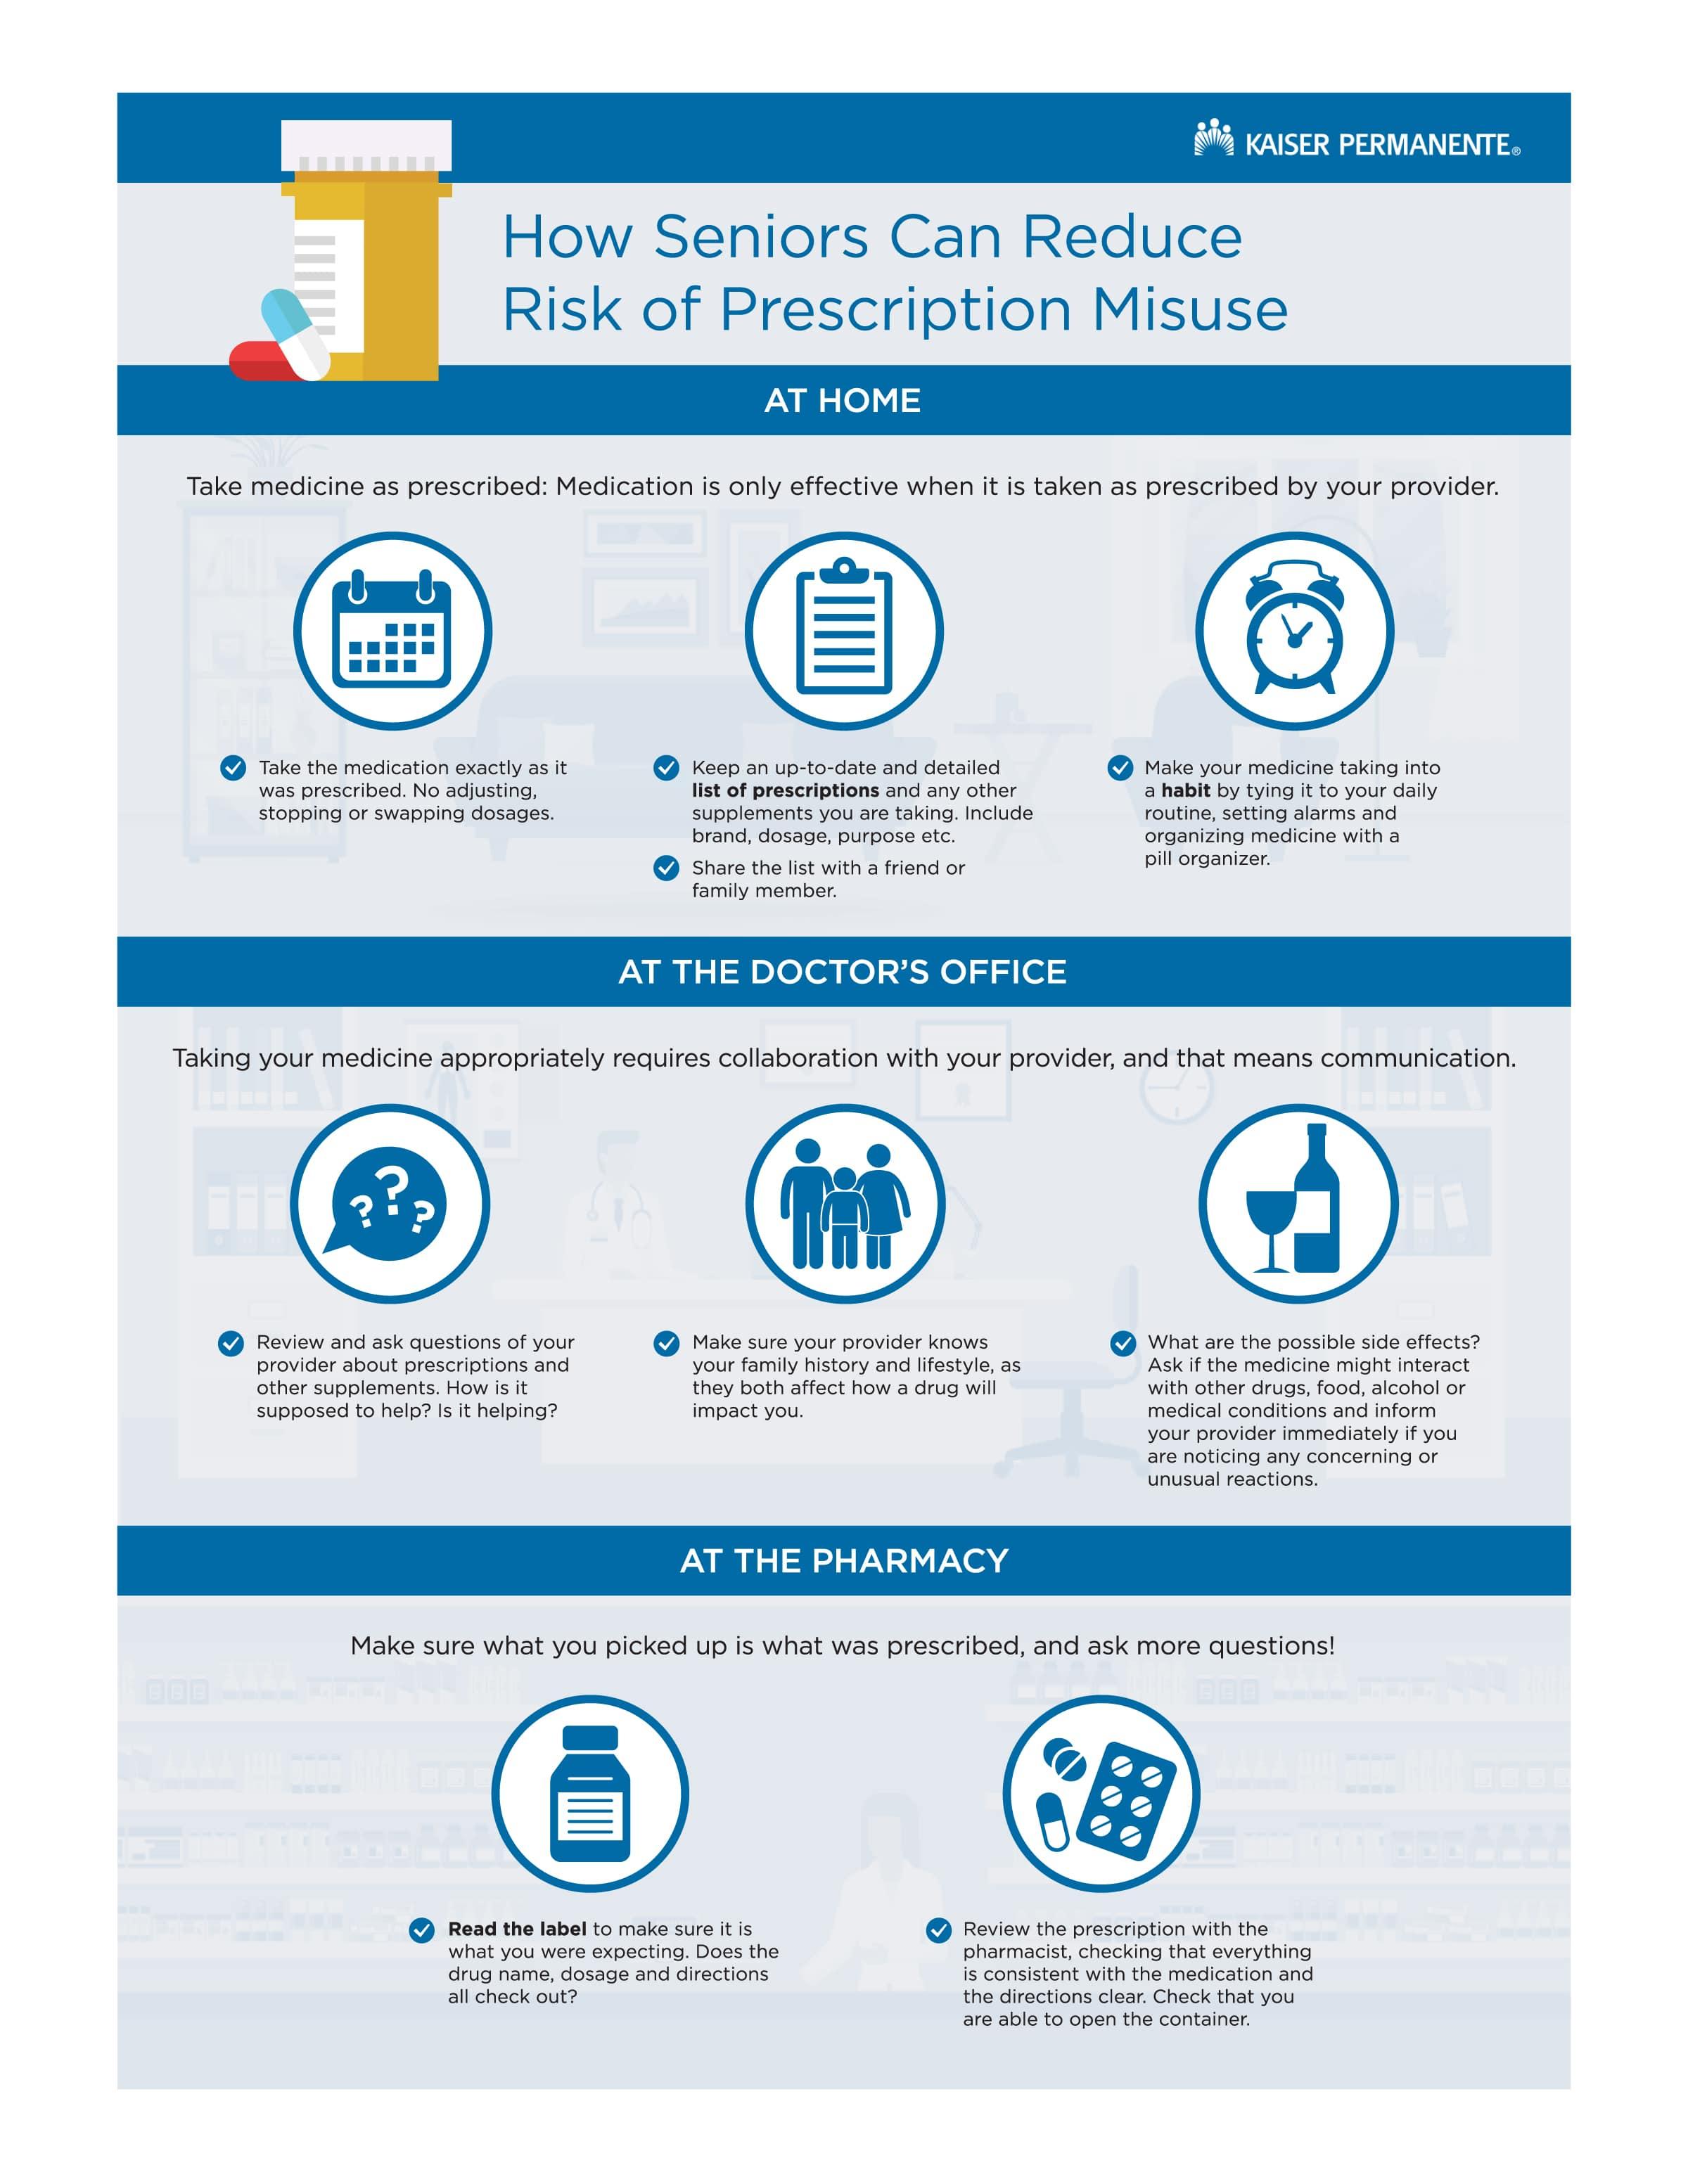 8 Key Tips For Managing Multiple Medications